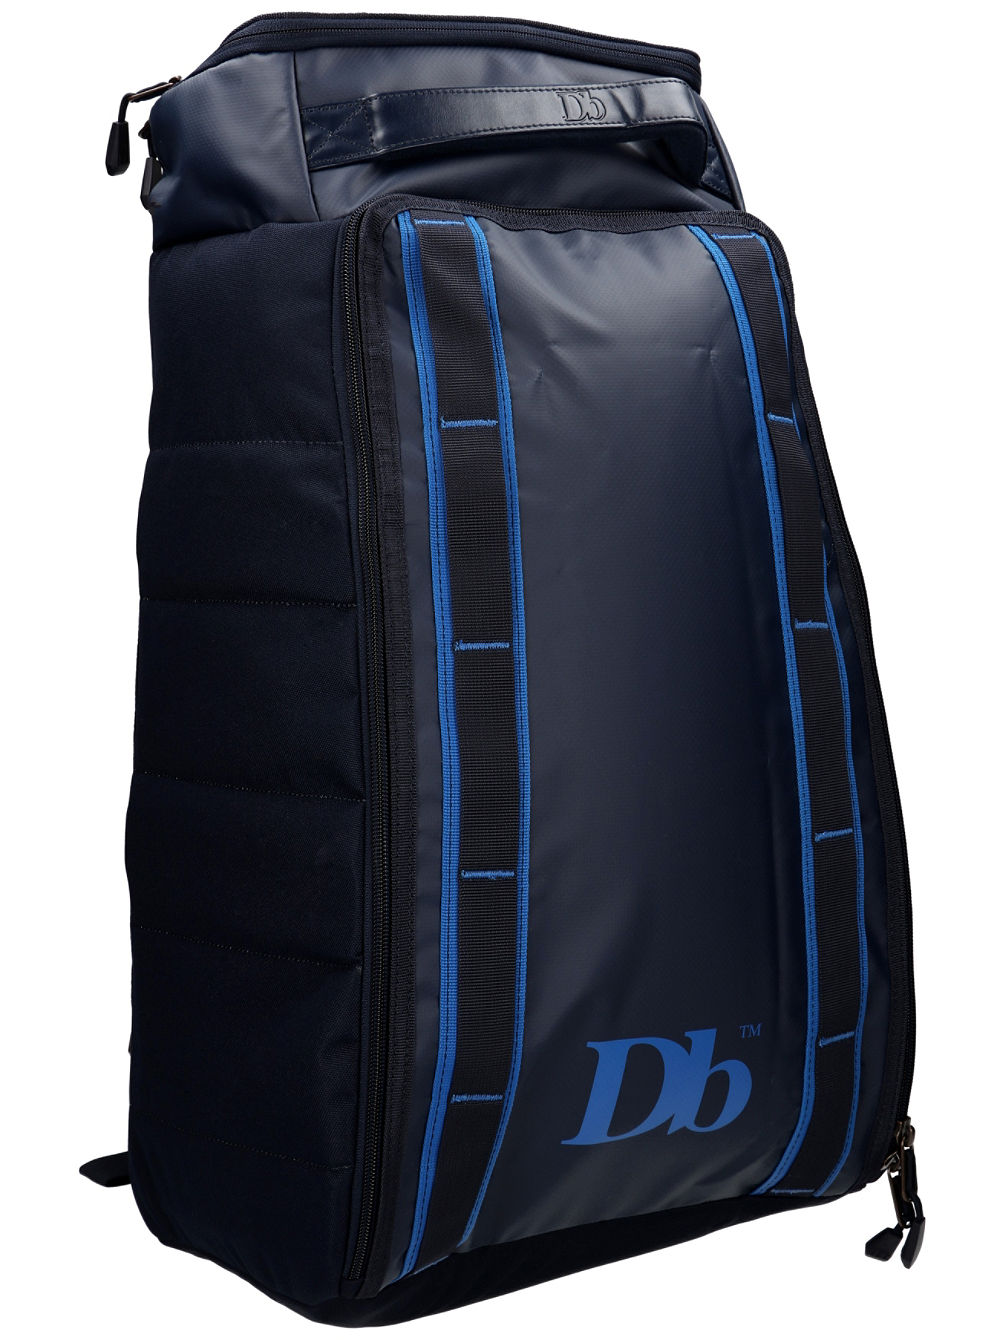 douchebags the hugger 30l rucksack online kaufen bei blue. Black Bedroom Furniture Sets. Home Design Ideas